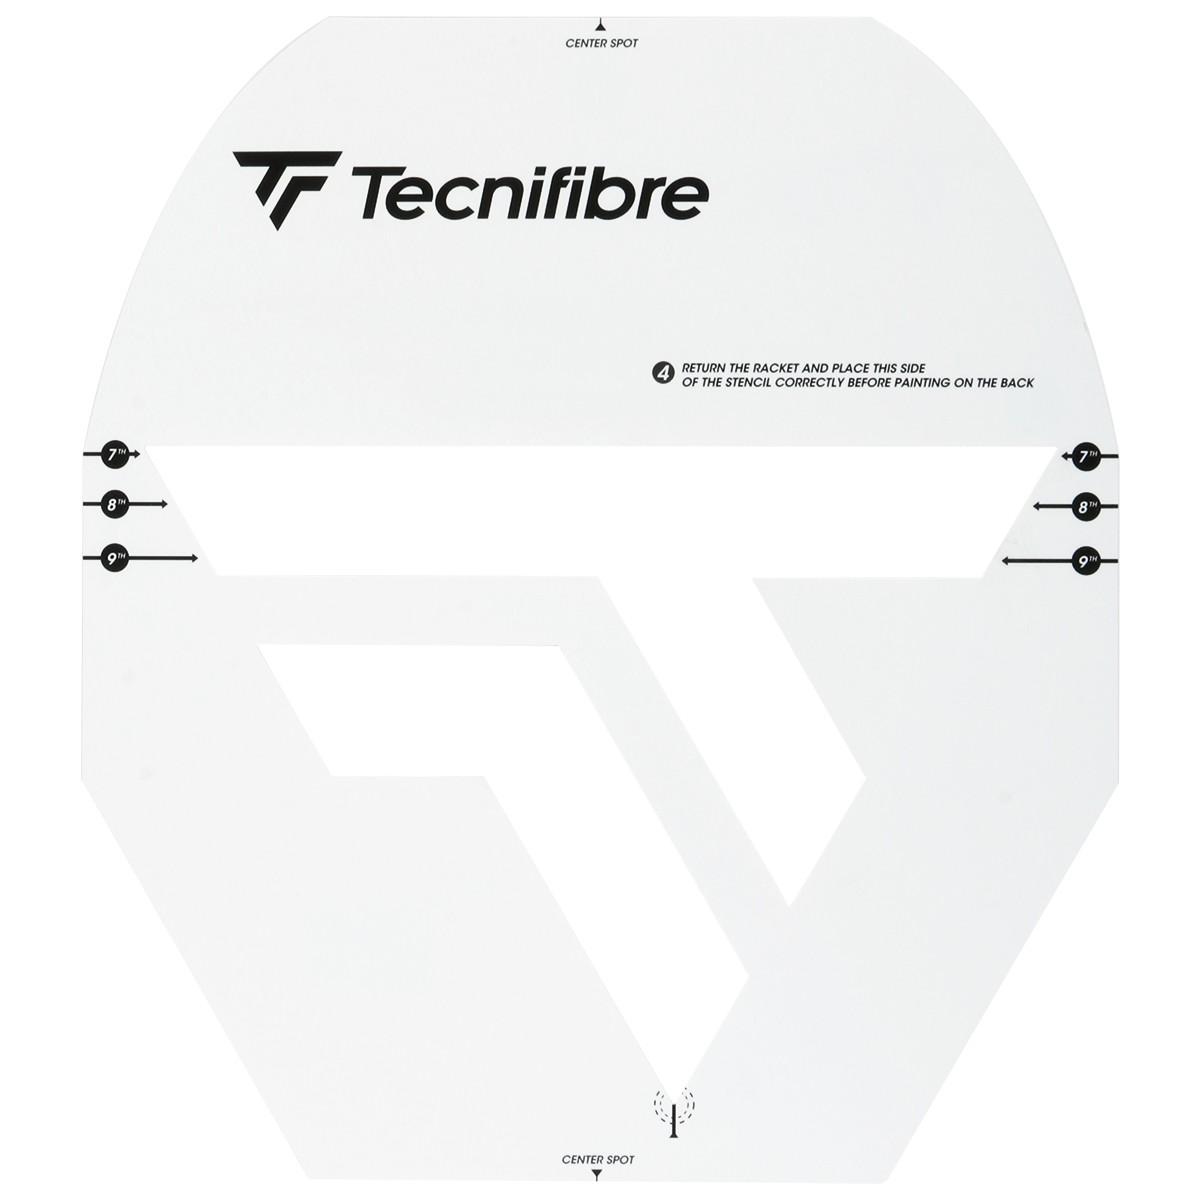 POCHOIR TECNIFIBRE (NEW LOGO)